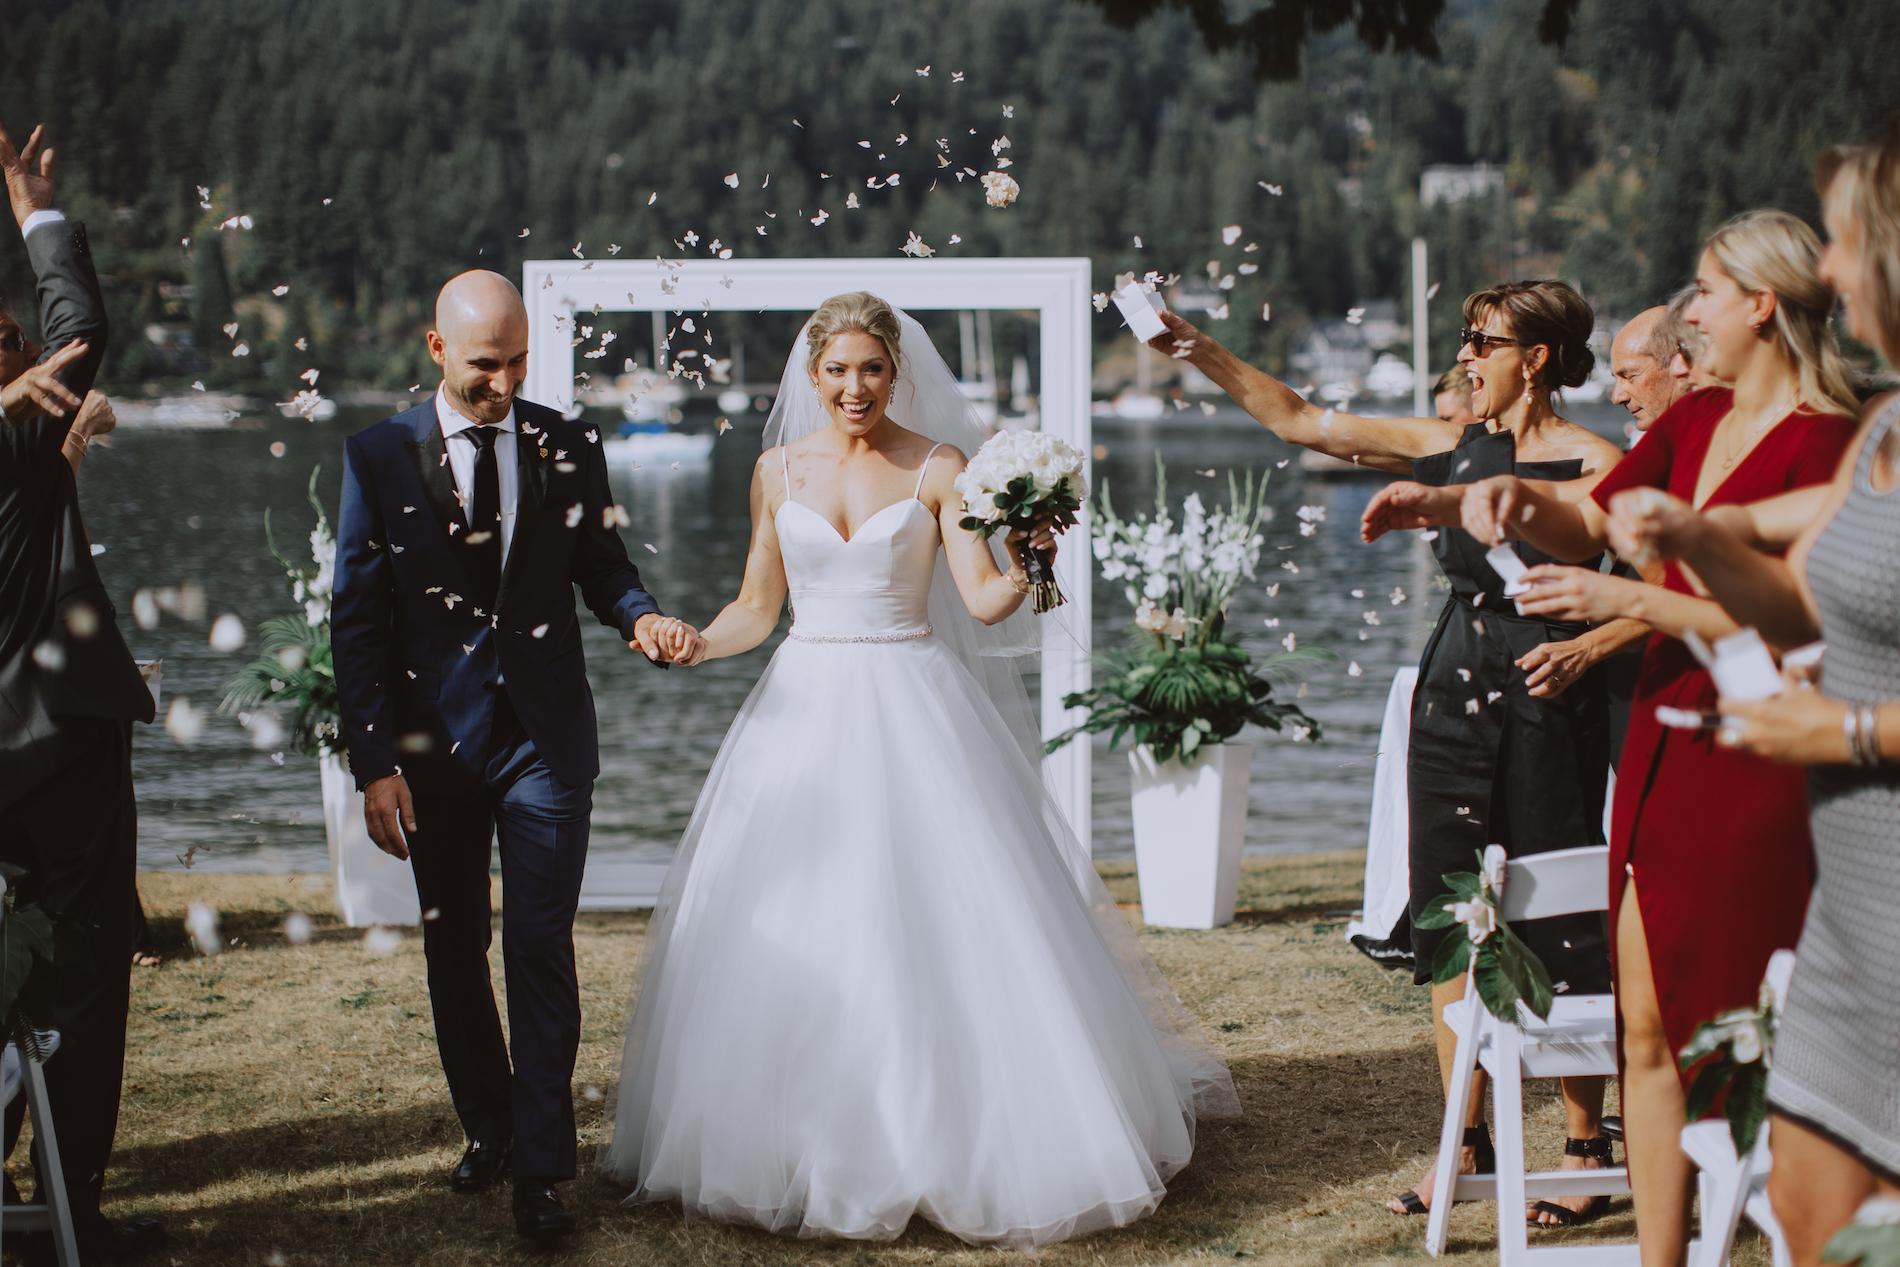 Bowen-Island-wedding-Bowen-Island-Lodge-vancouver-island-wedding-photographer-18.jpg